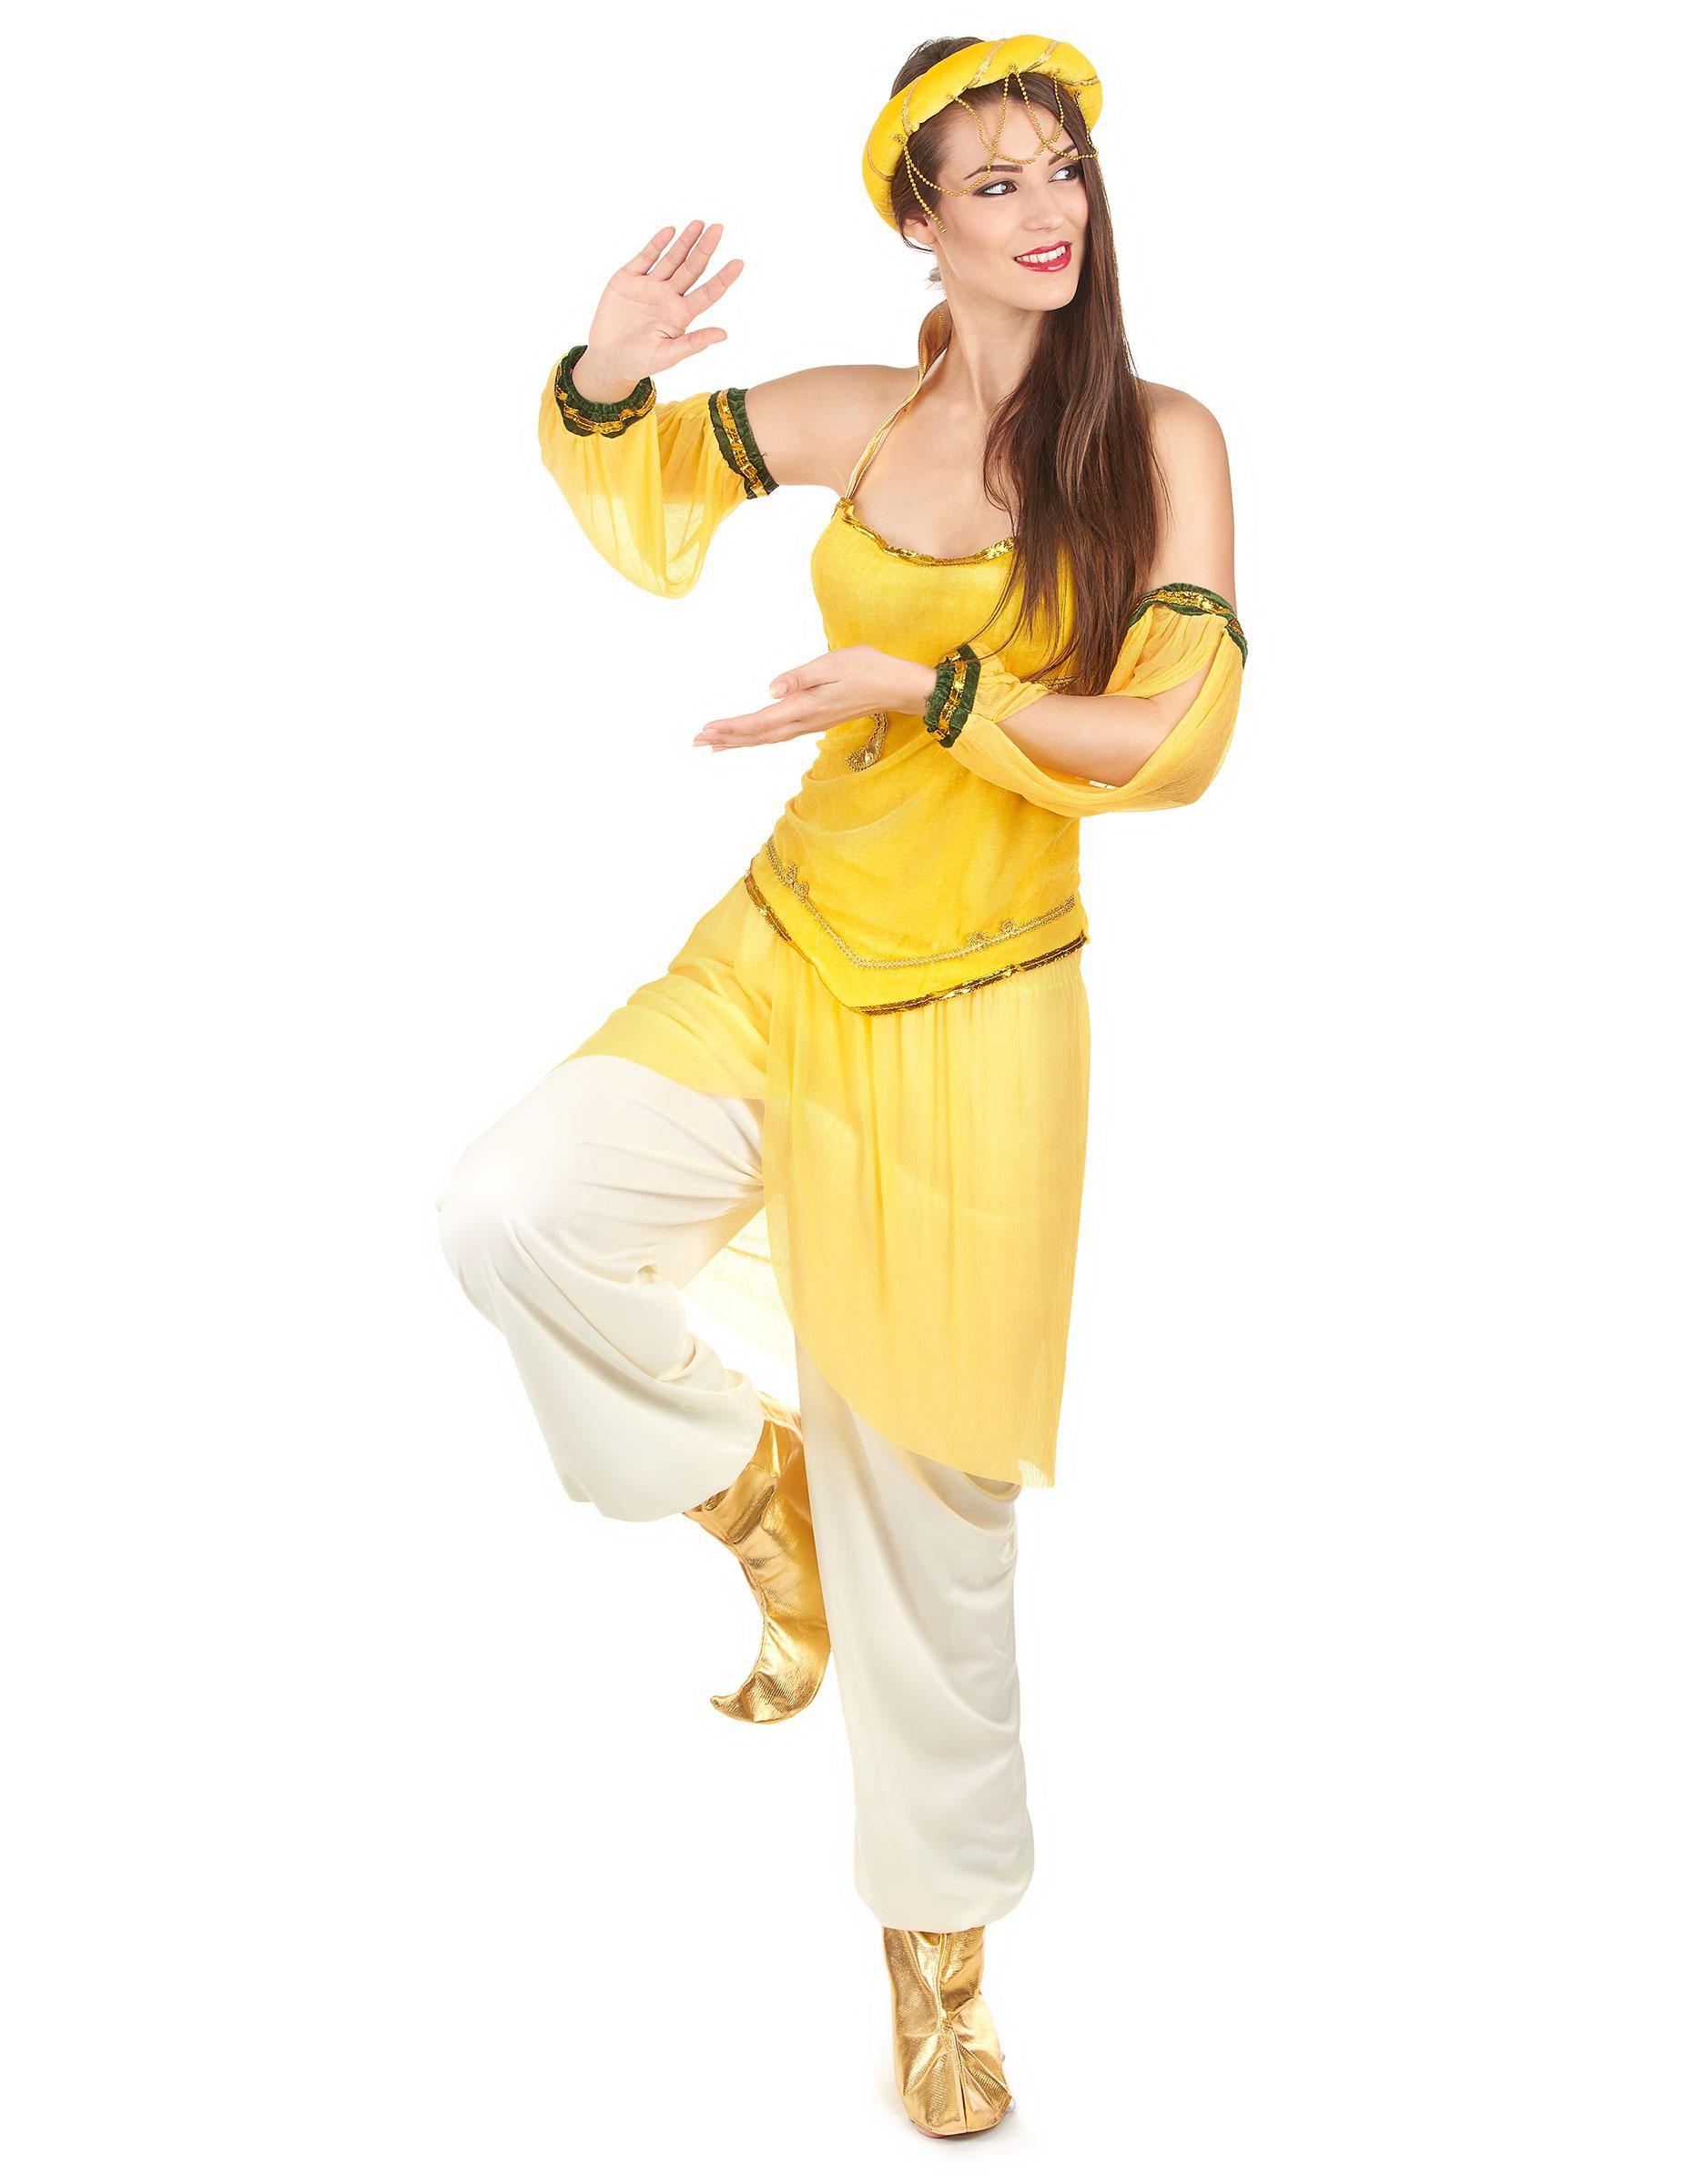 d guisement danseuse orientale jaune femme deguise toi. Black Bedroom Furniture Sets. Home Design Ideas